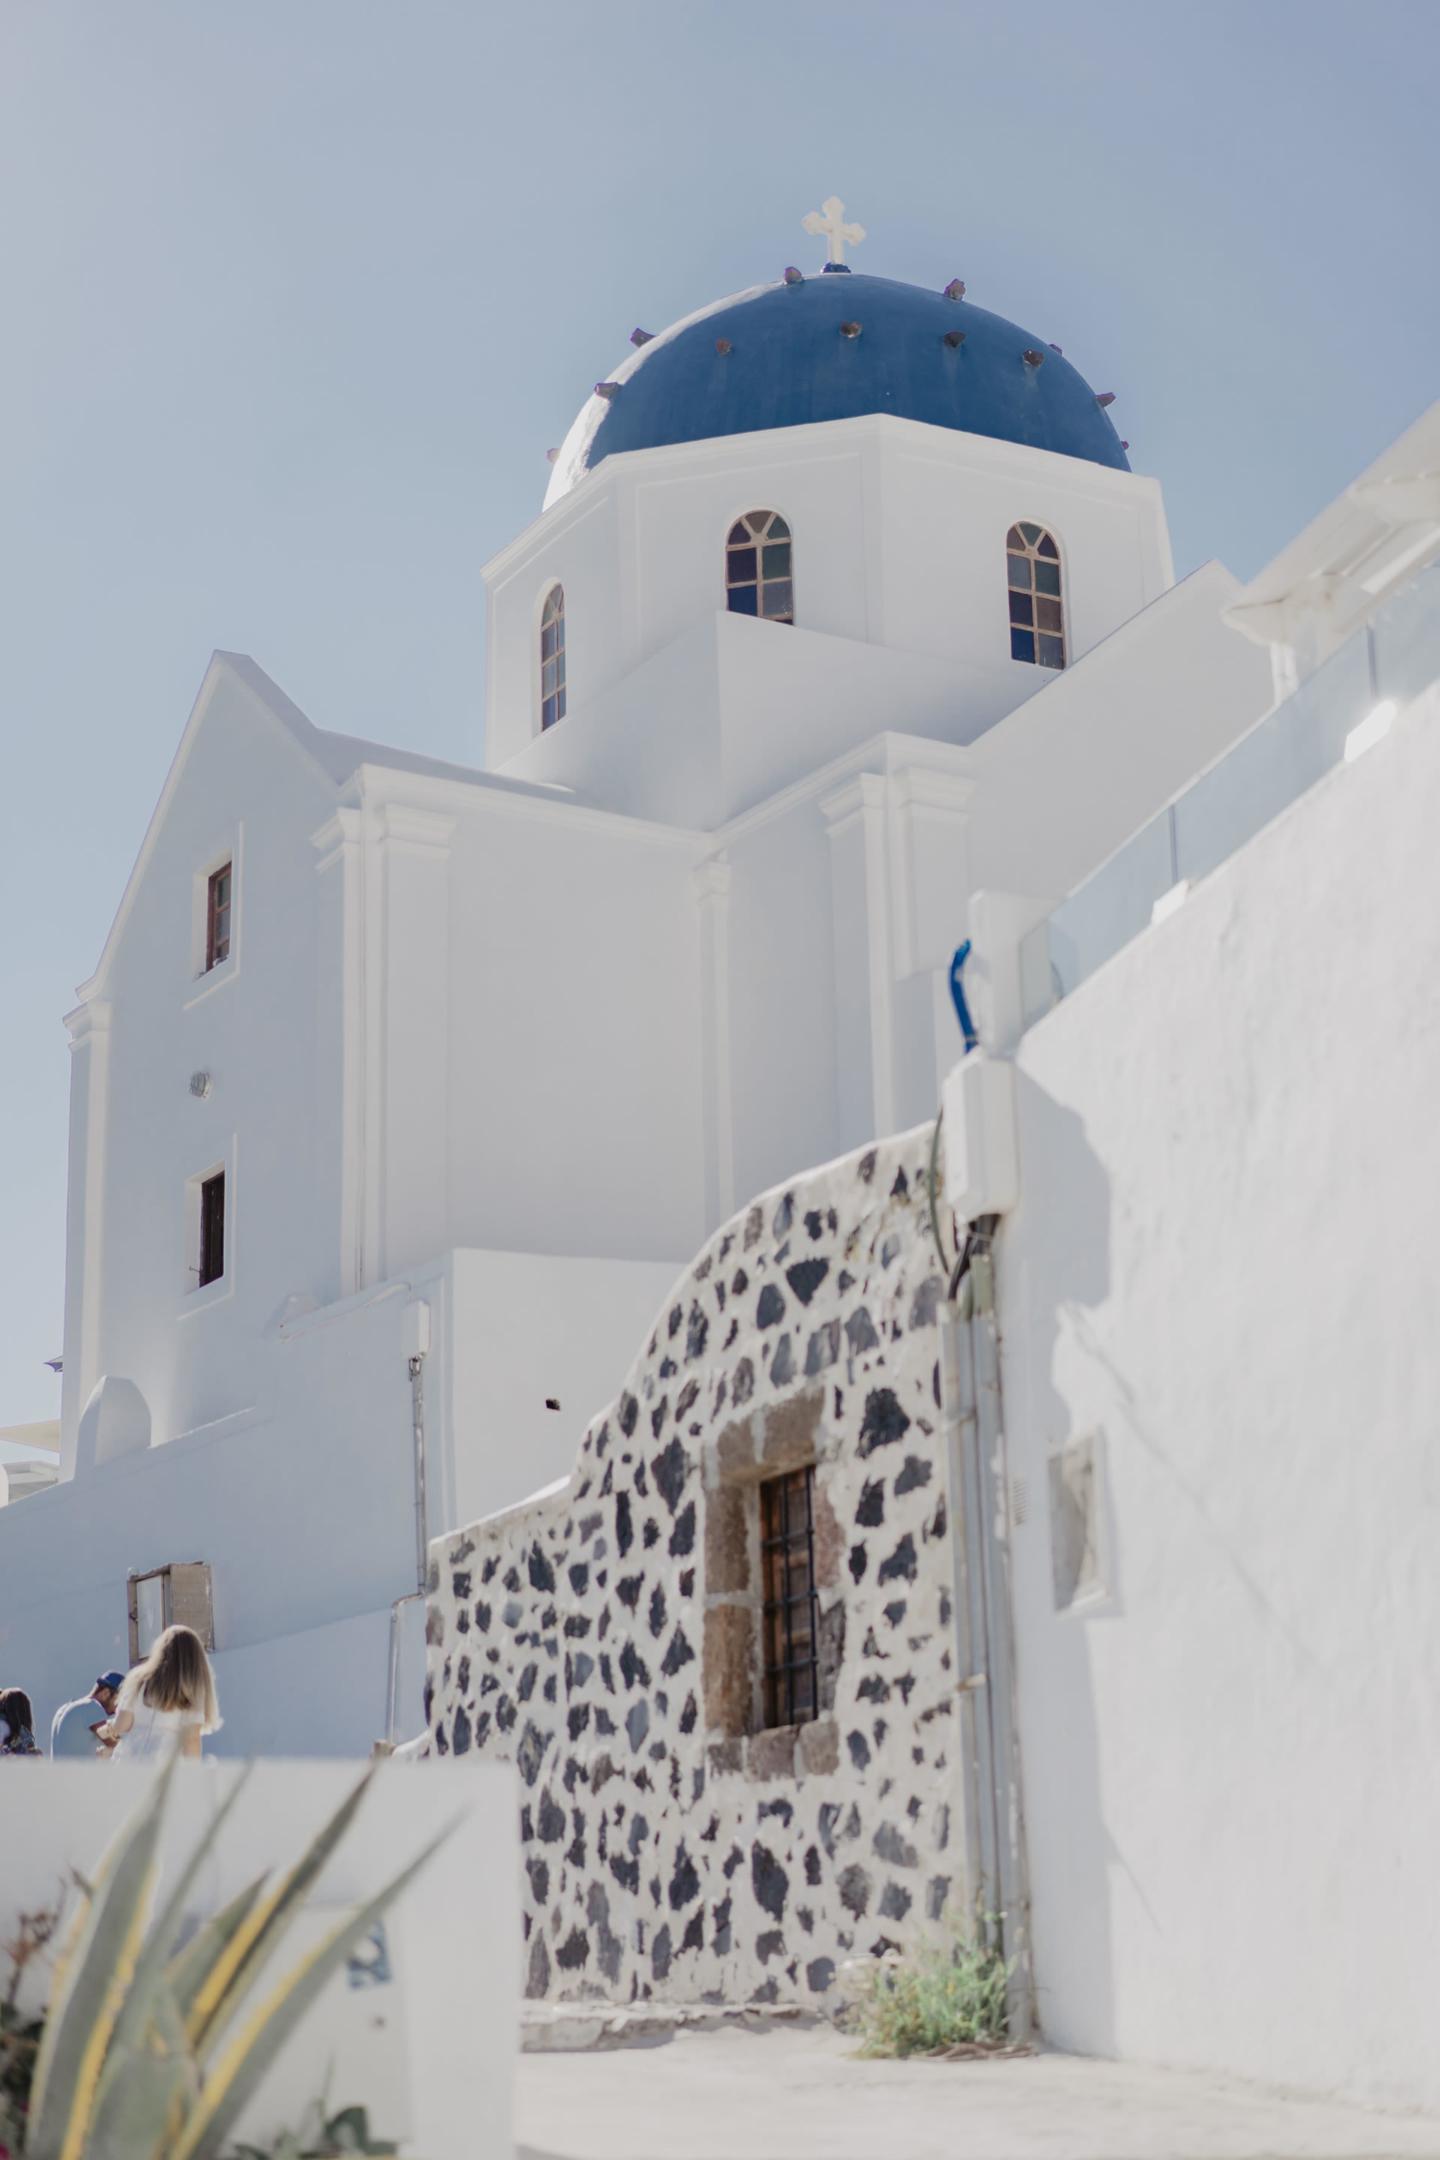 - 20 :: Santorini, a white wedding in a white island :: Luxury wedding photography - 19 ::  - 20